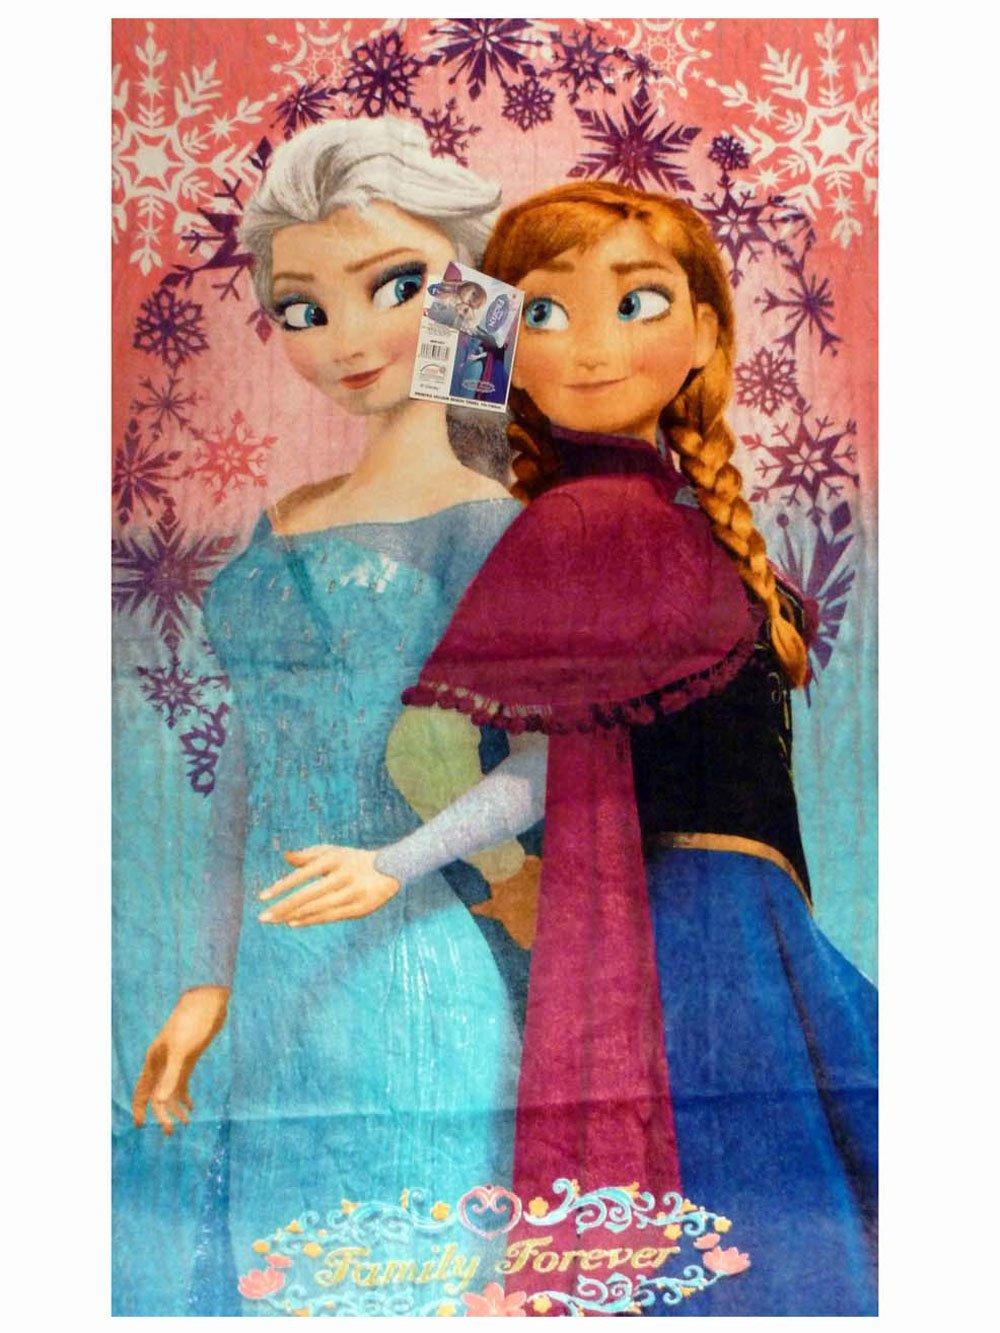 La Reina de las Nieves - Beach Blanket Familia Forever (Kids Euroswan WD51051)